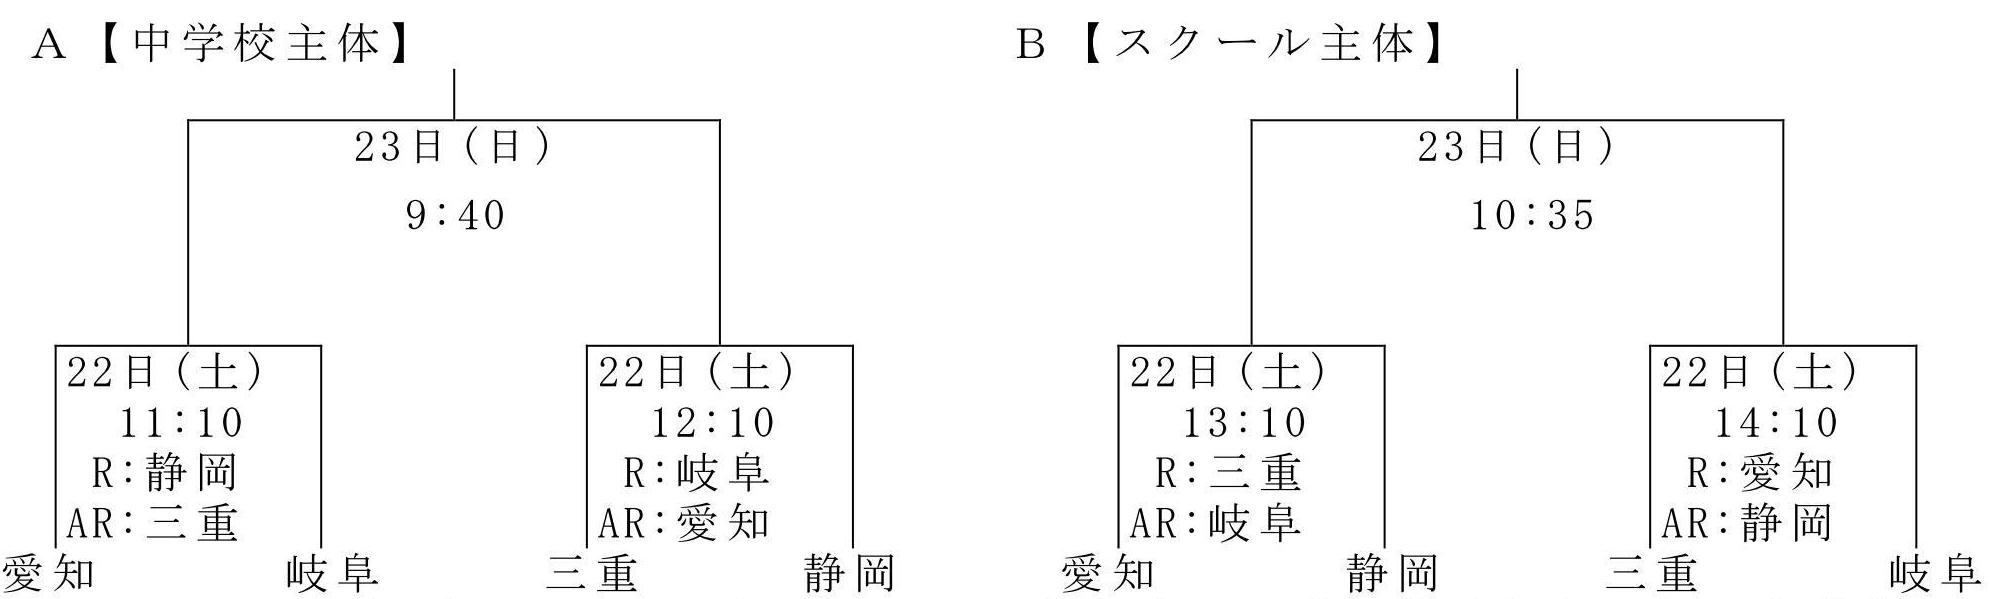 2014112022011205a.jpg